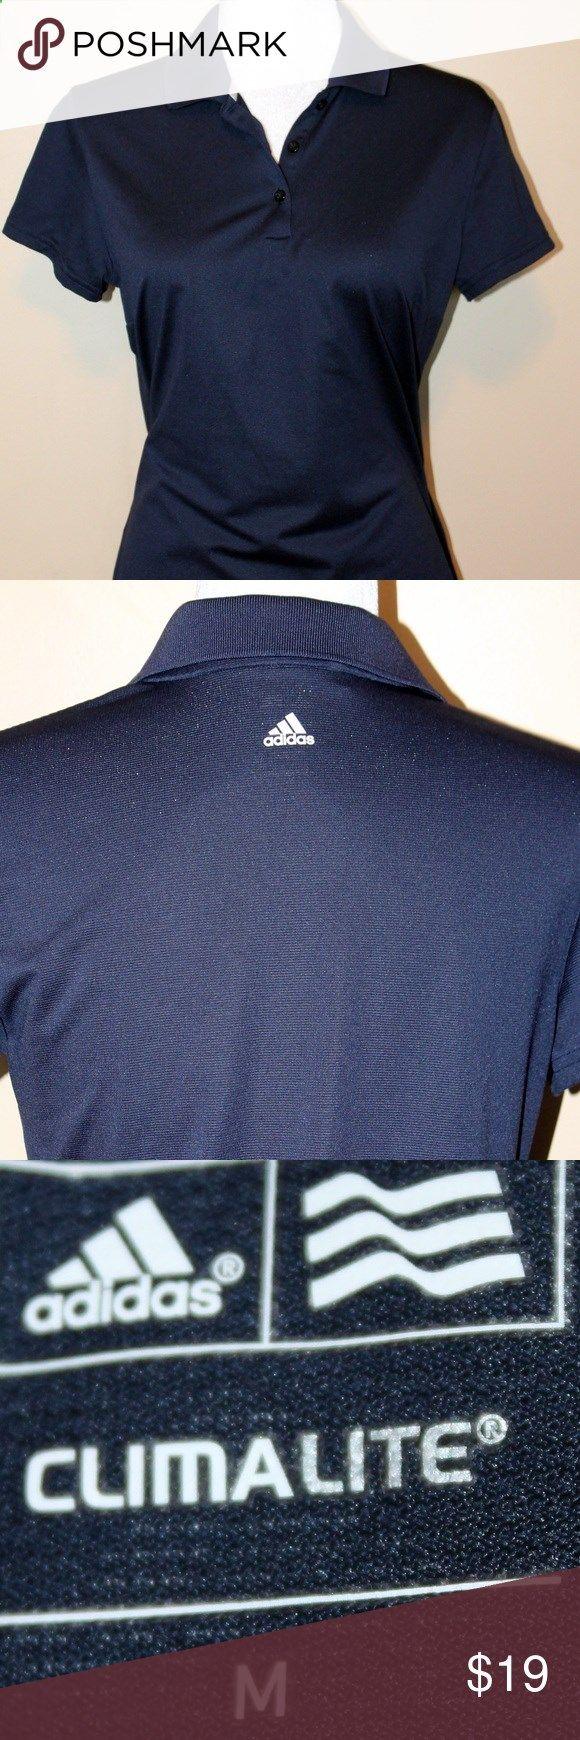 Golf Shirts - ADIDAS Navy blue Golf Shirt Navy blue golf shirt from Adidas with climalite technology Adidas Tops